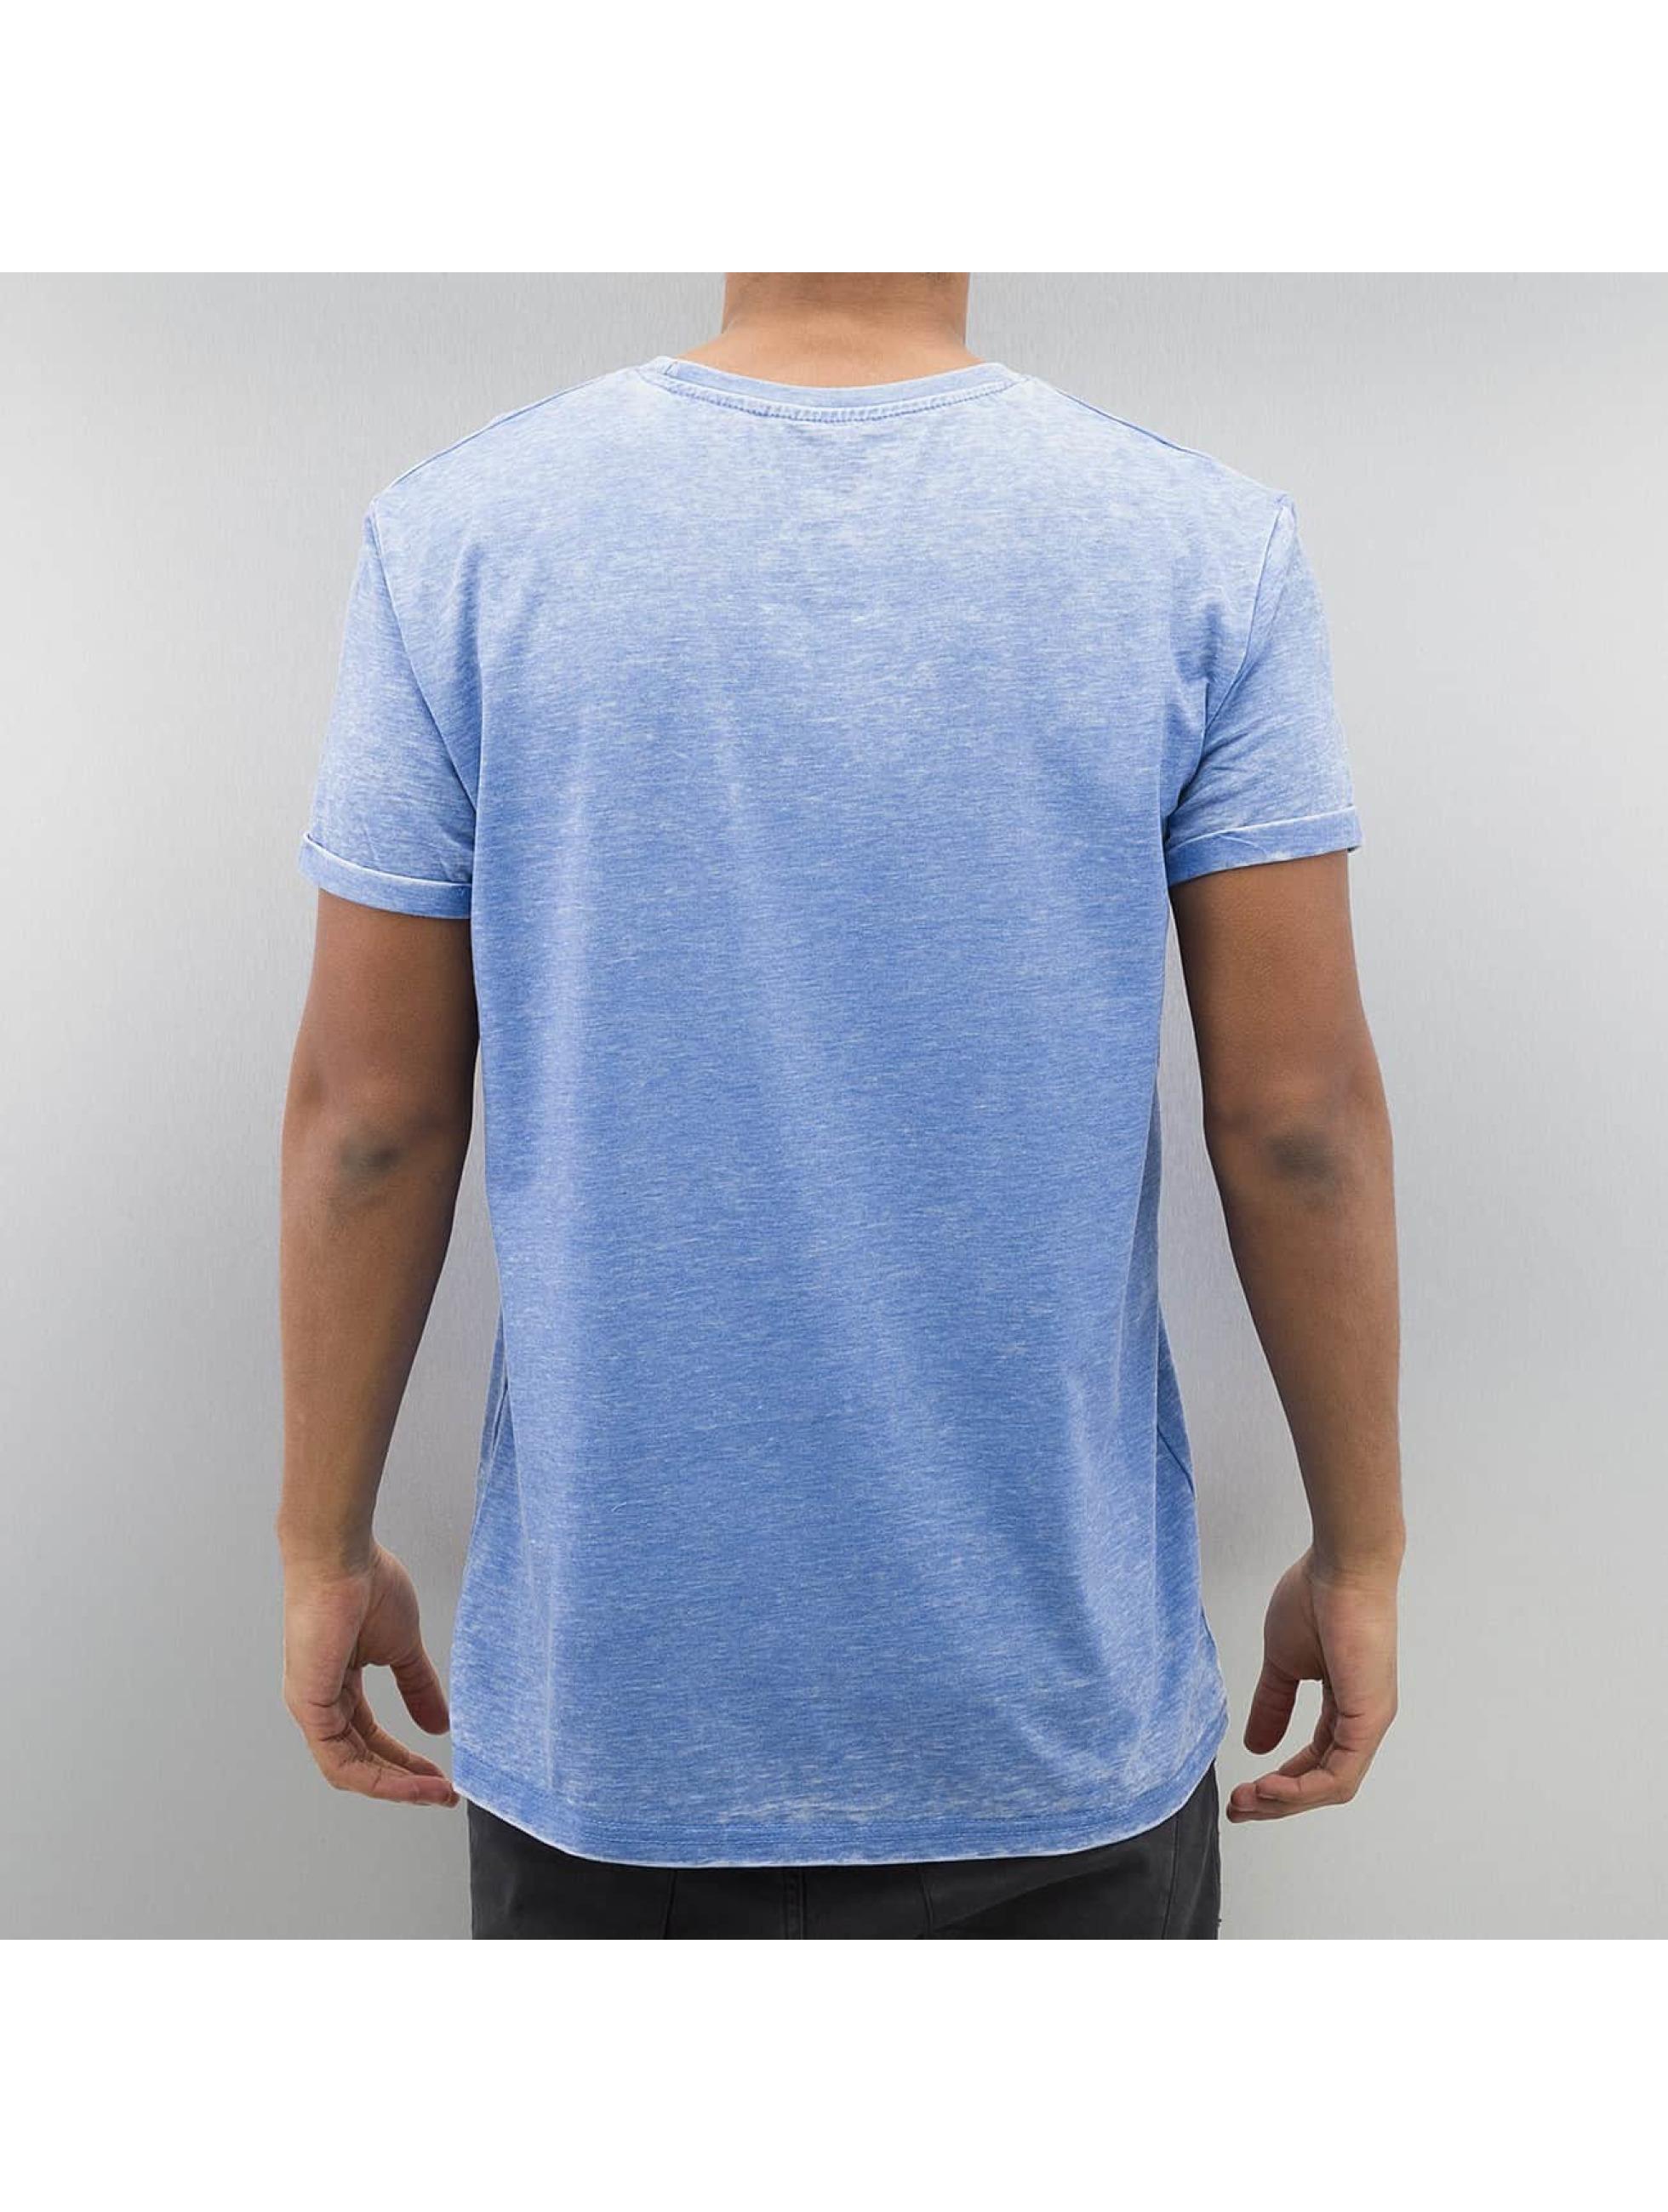 Monkey Business T-Shirt Geometric Skull bleu